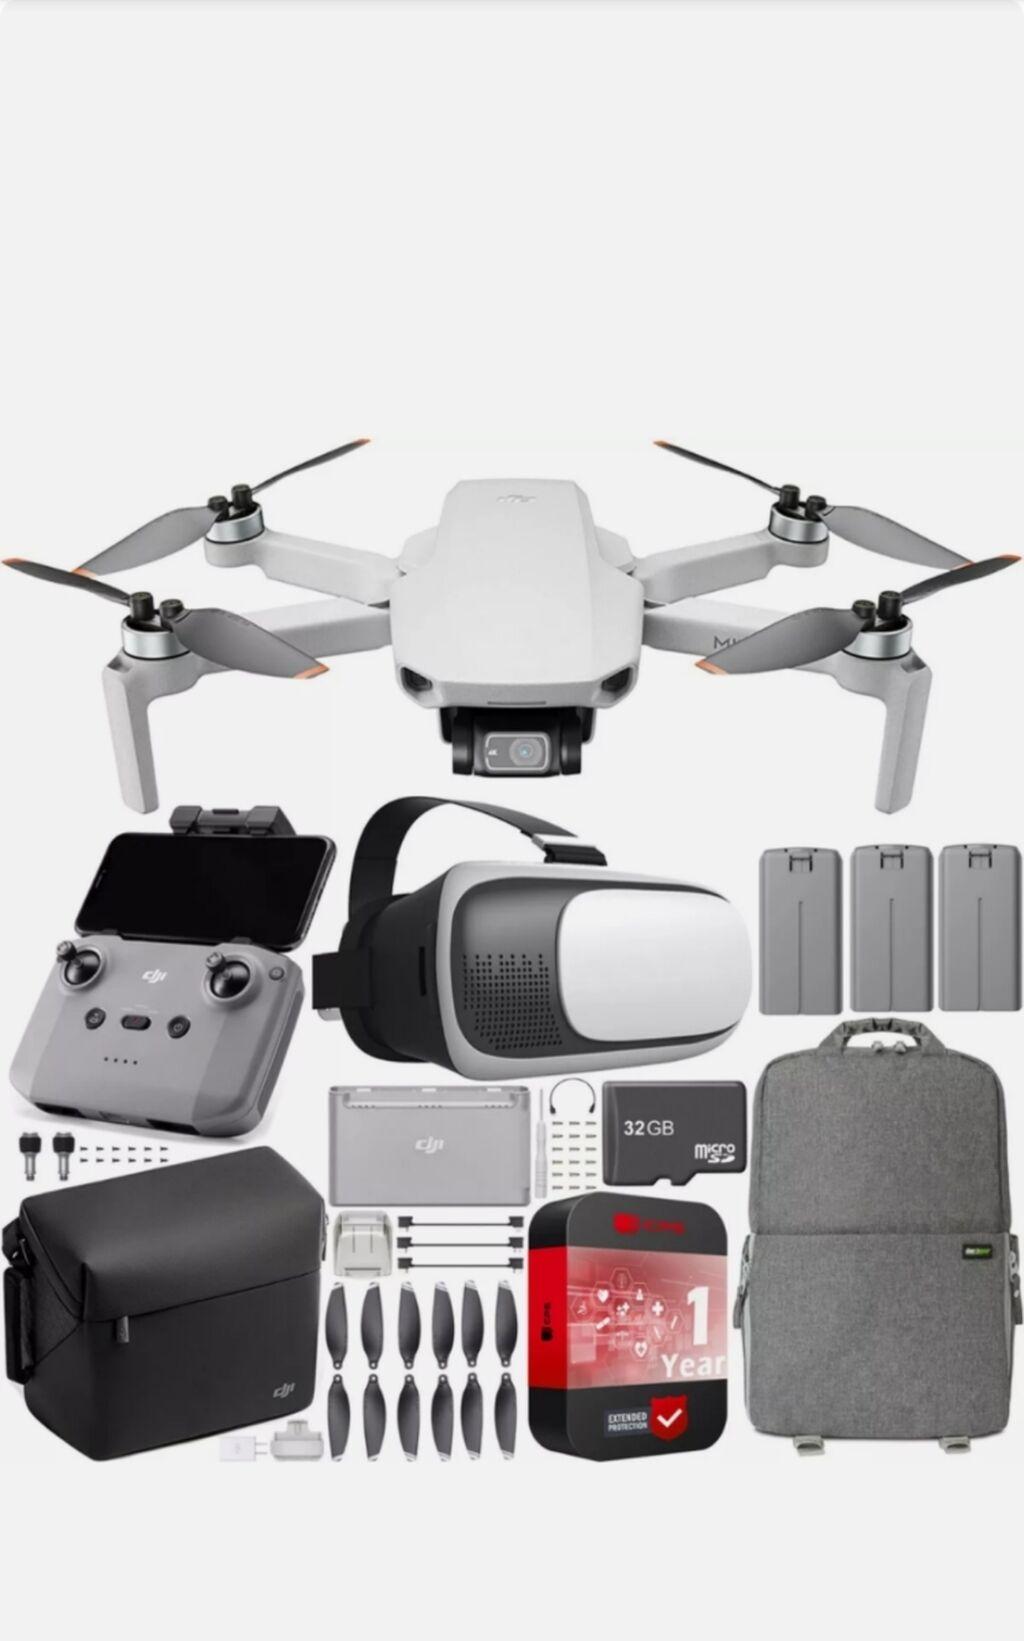 DJI Mini 2 Drone 4K Quadcopter Fly More Combo Полностью, всё что на фо: DJI Mini 2 Drone 4K Quadcopter Fly More Combo Полностью, всё что на фо